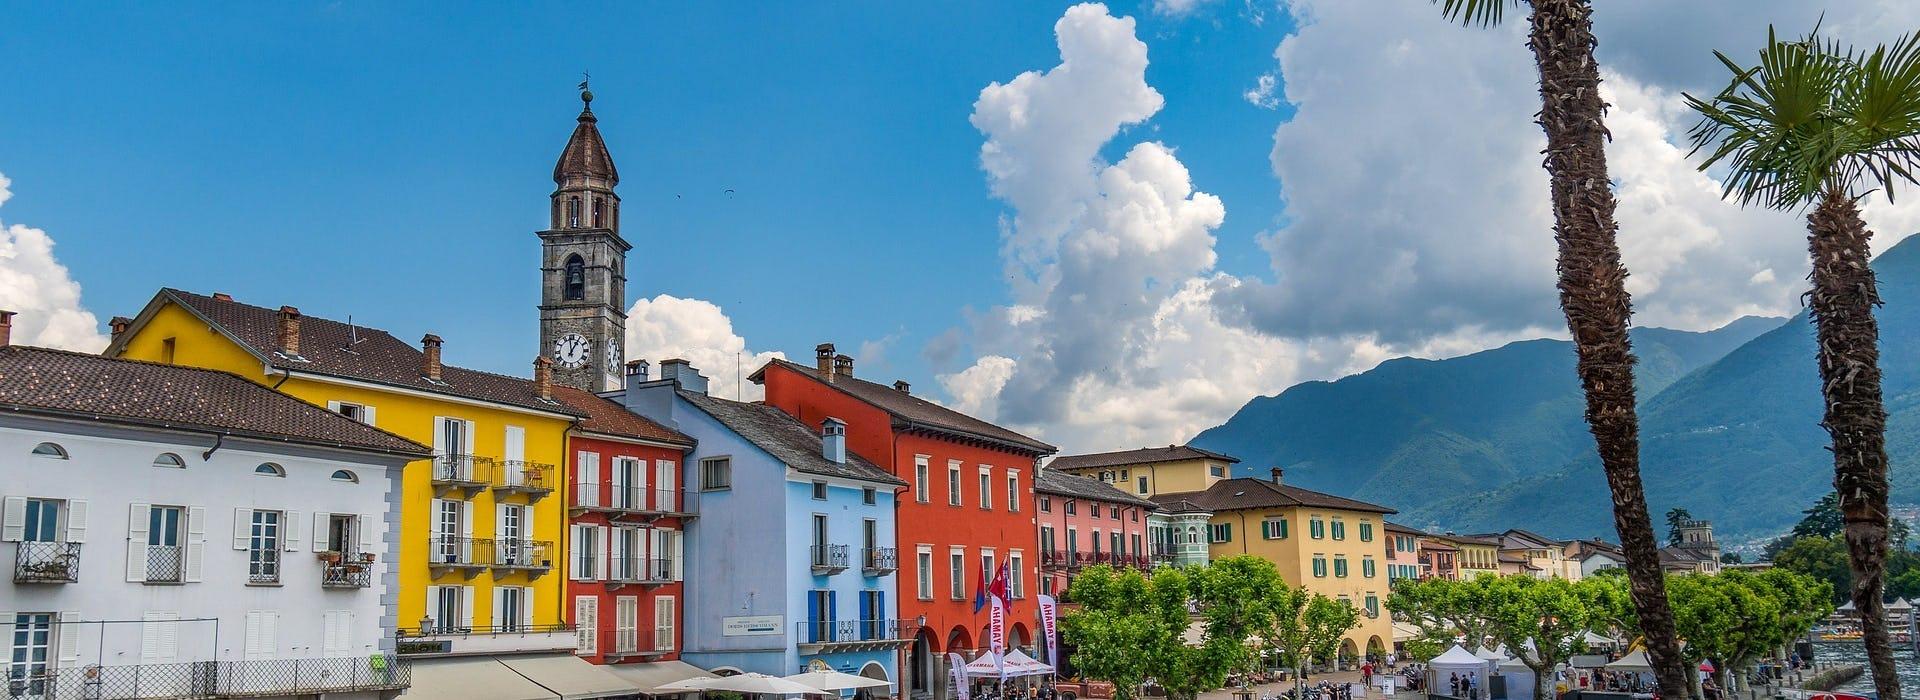 Ascona Tagesausflug